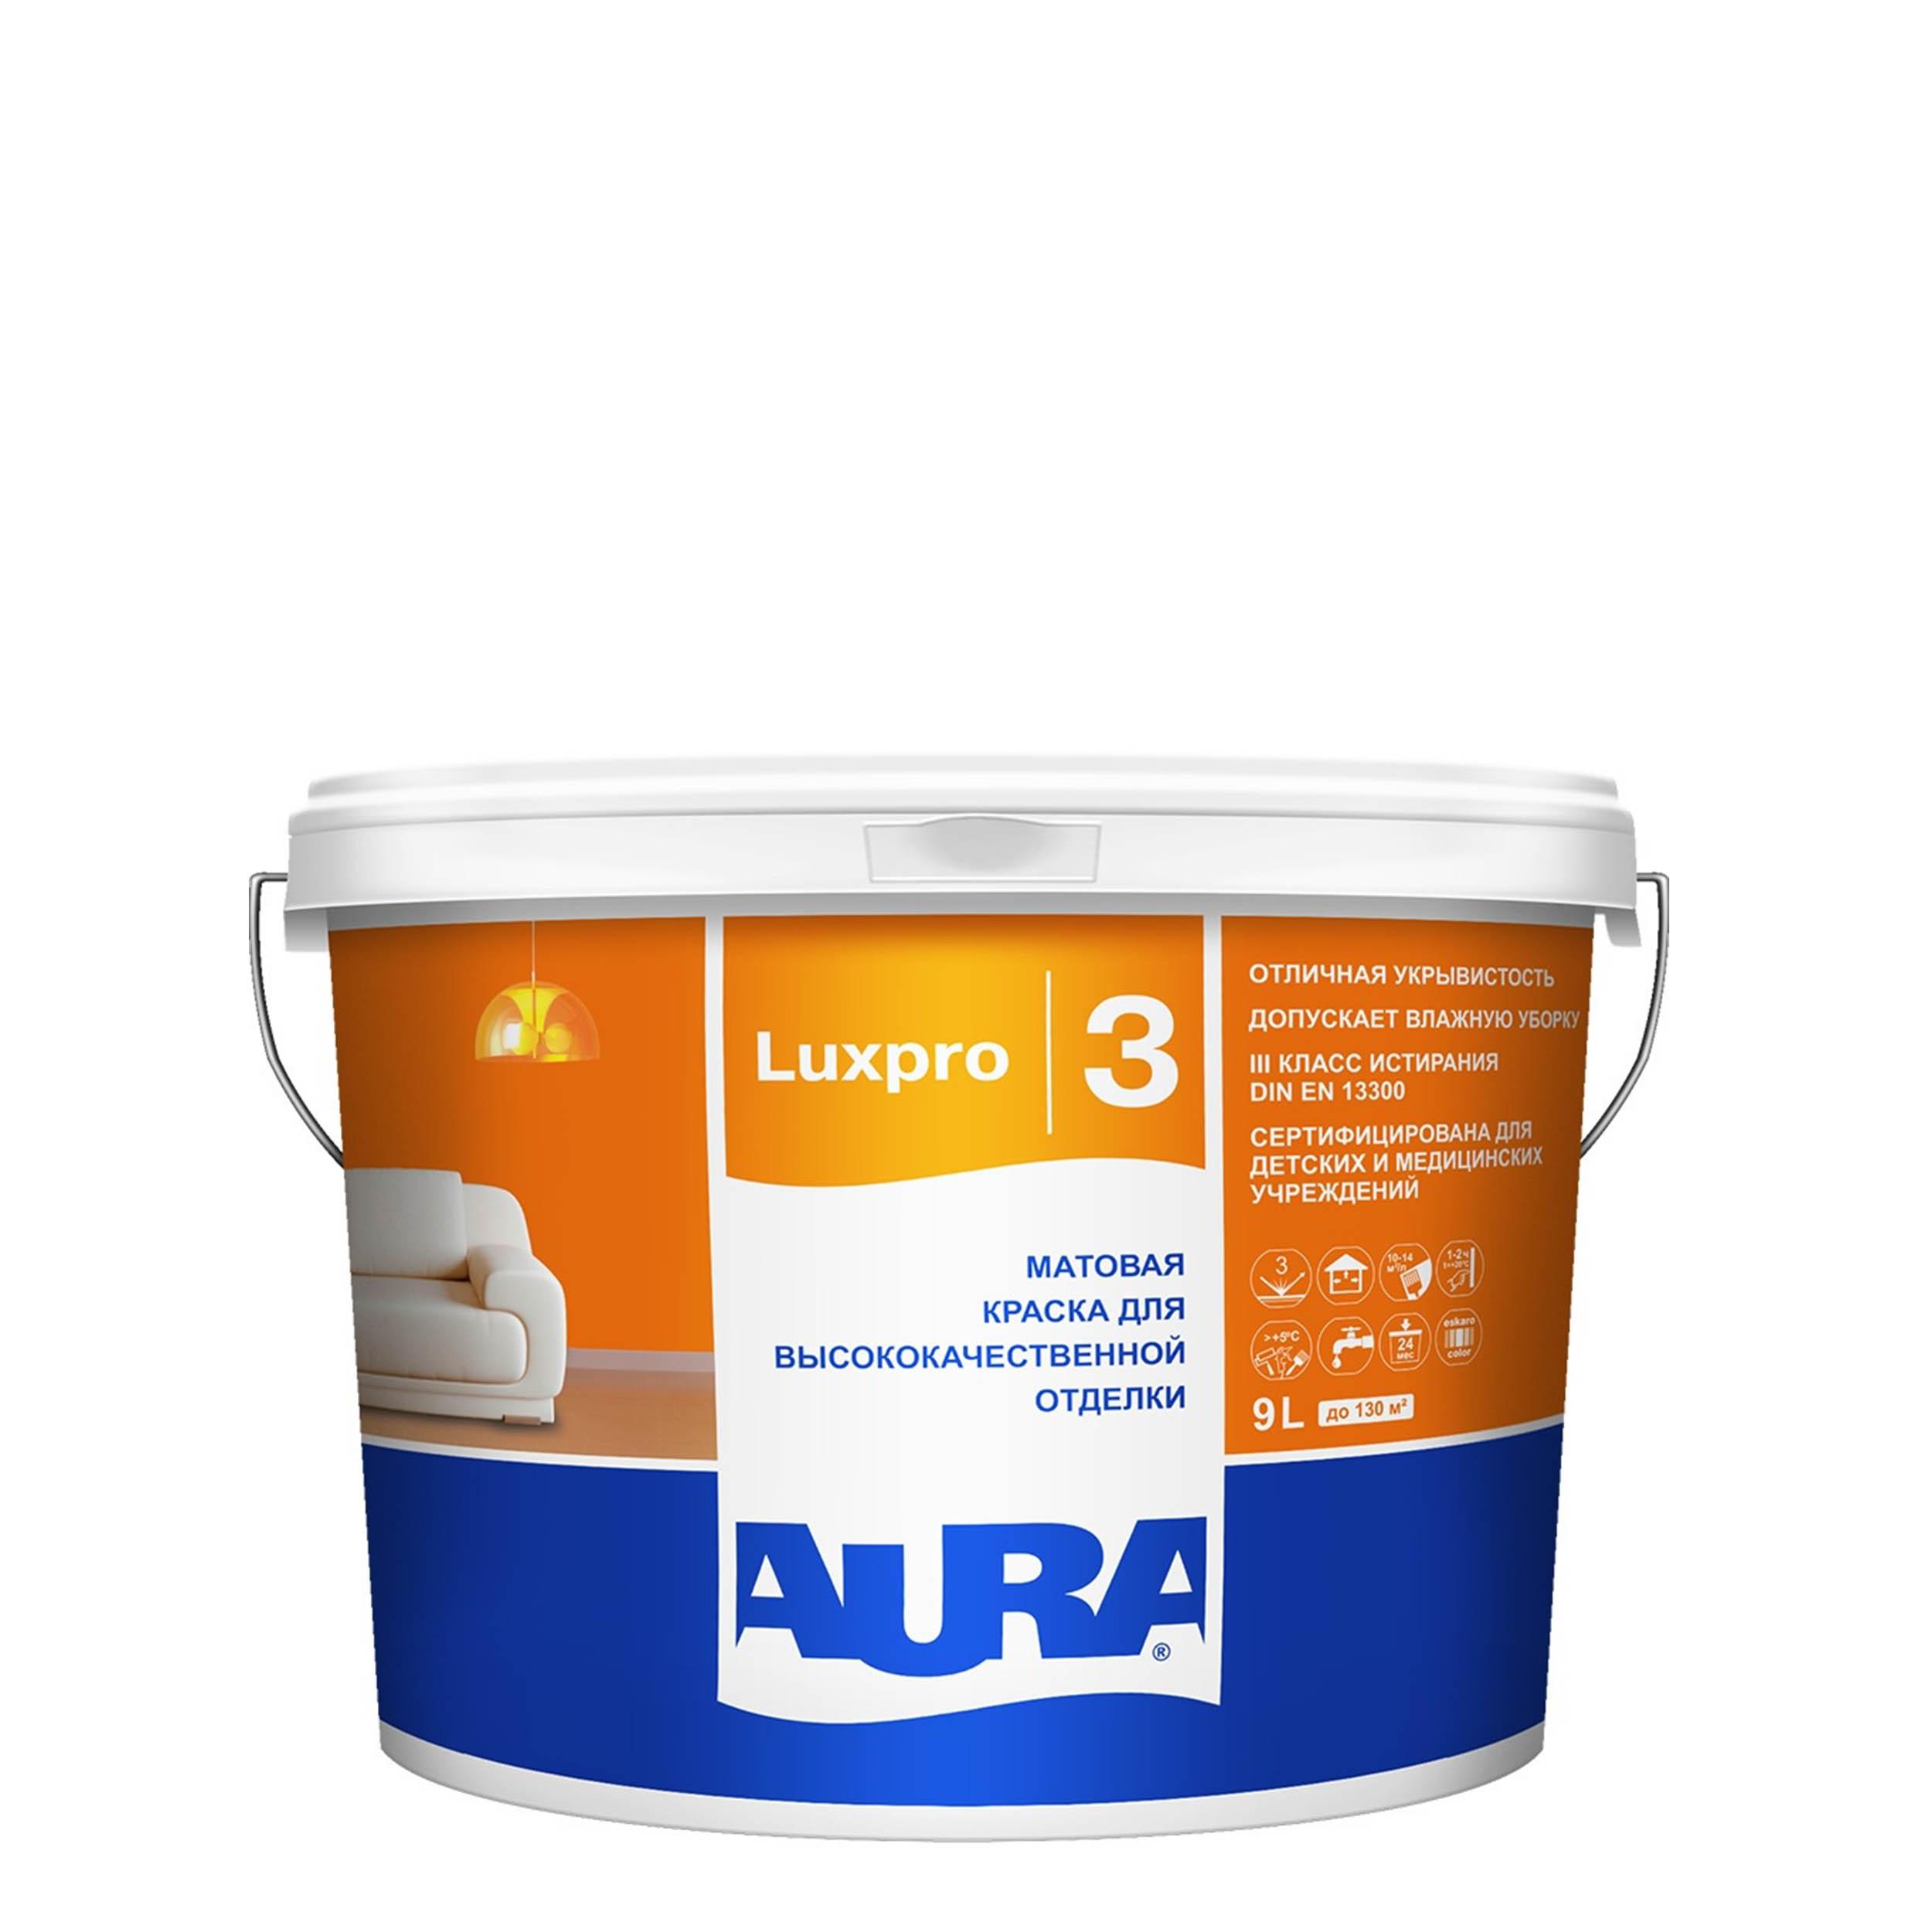 Фото 4 - Краска интерьерная, Aura LuxPRO 3, RAL 8012, 11 кг.